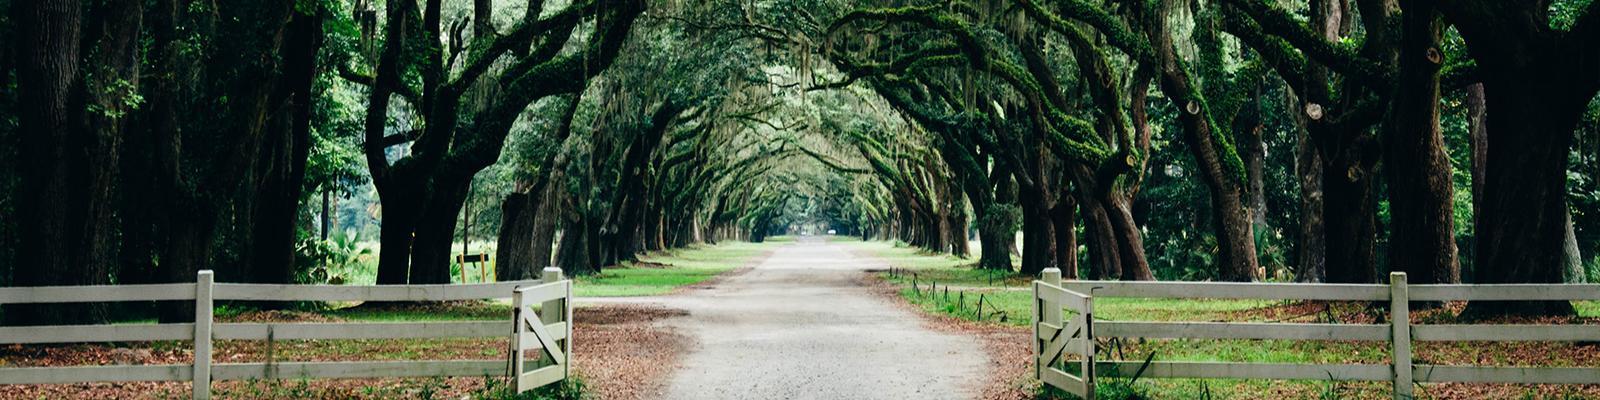 Spanish moss trees in Savannah